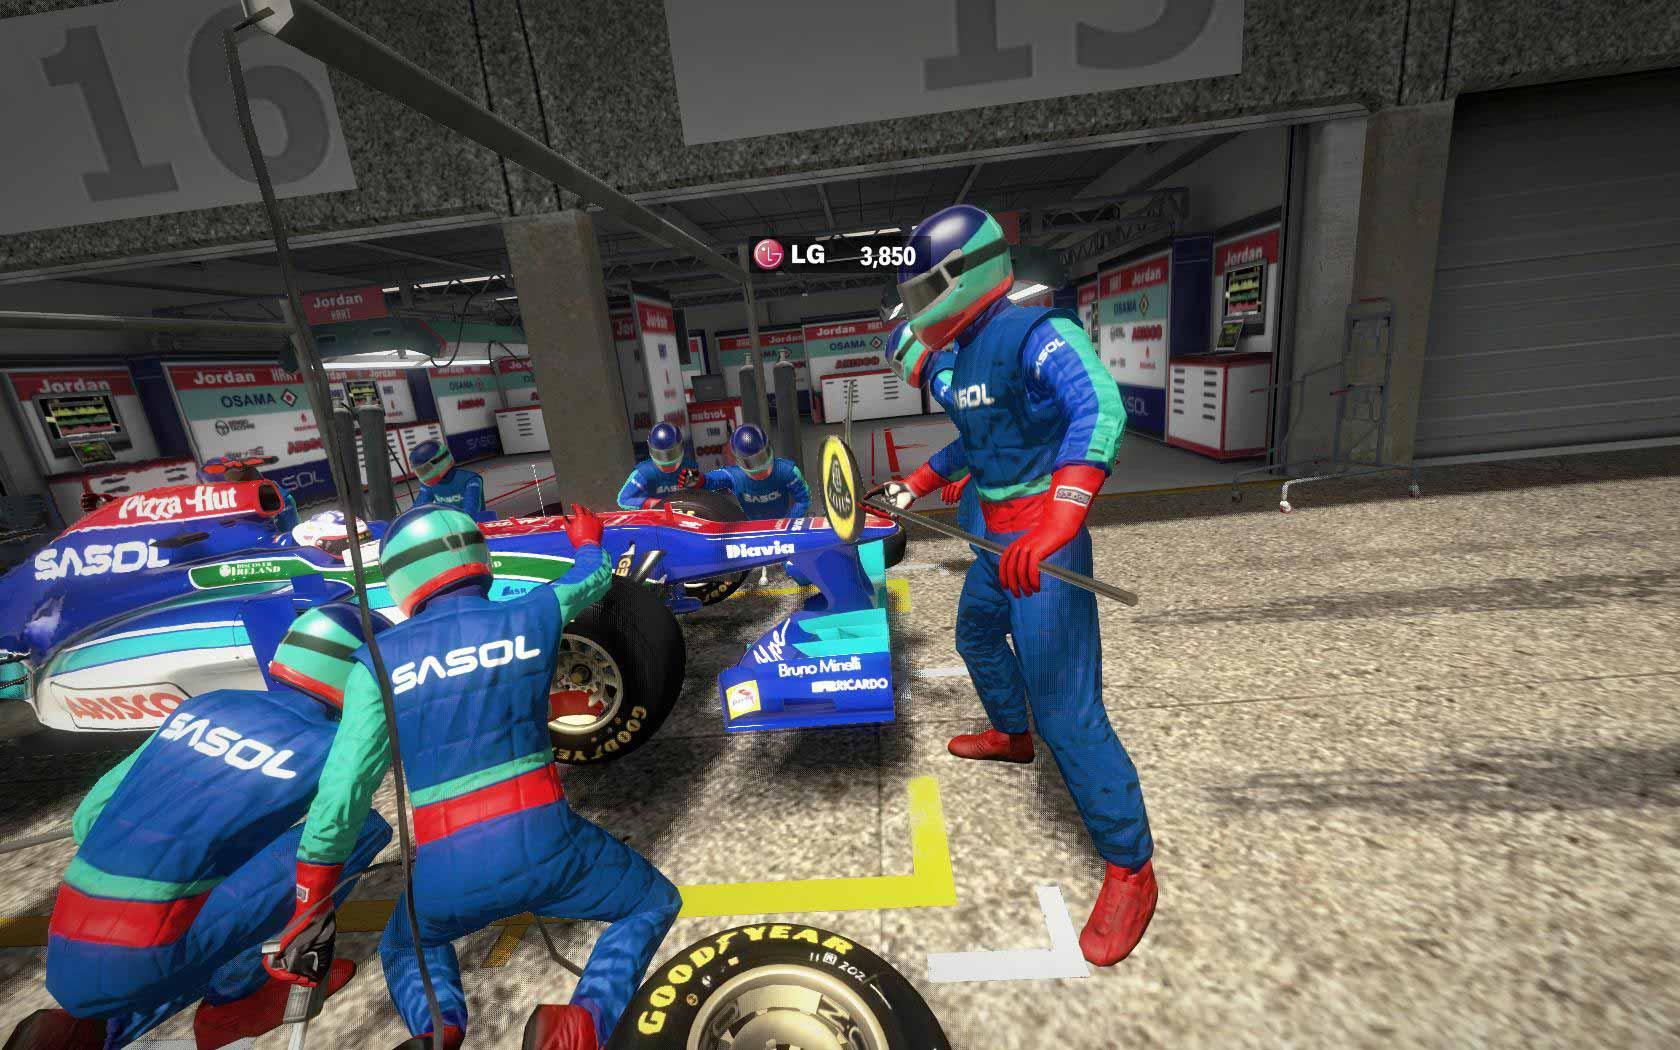 1994-Jordan-pitstop.jpg